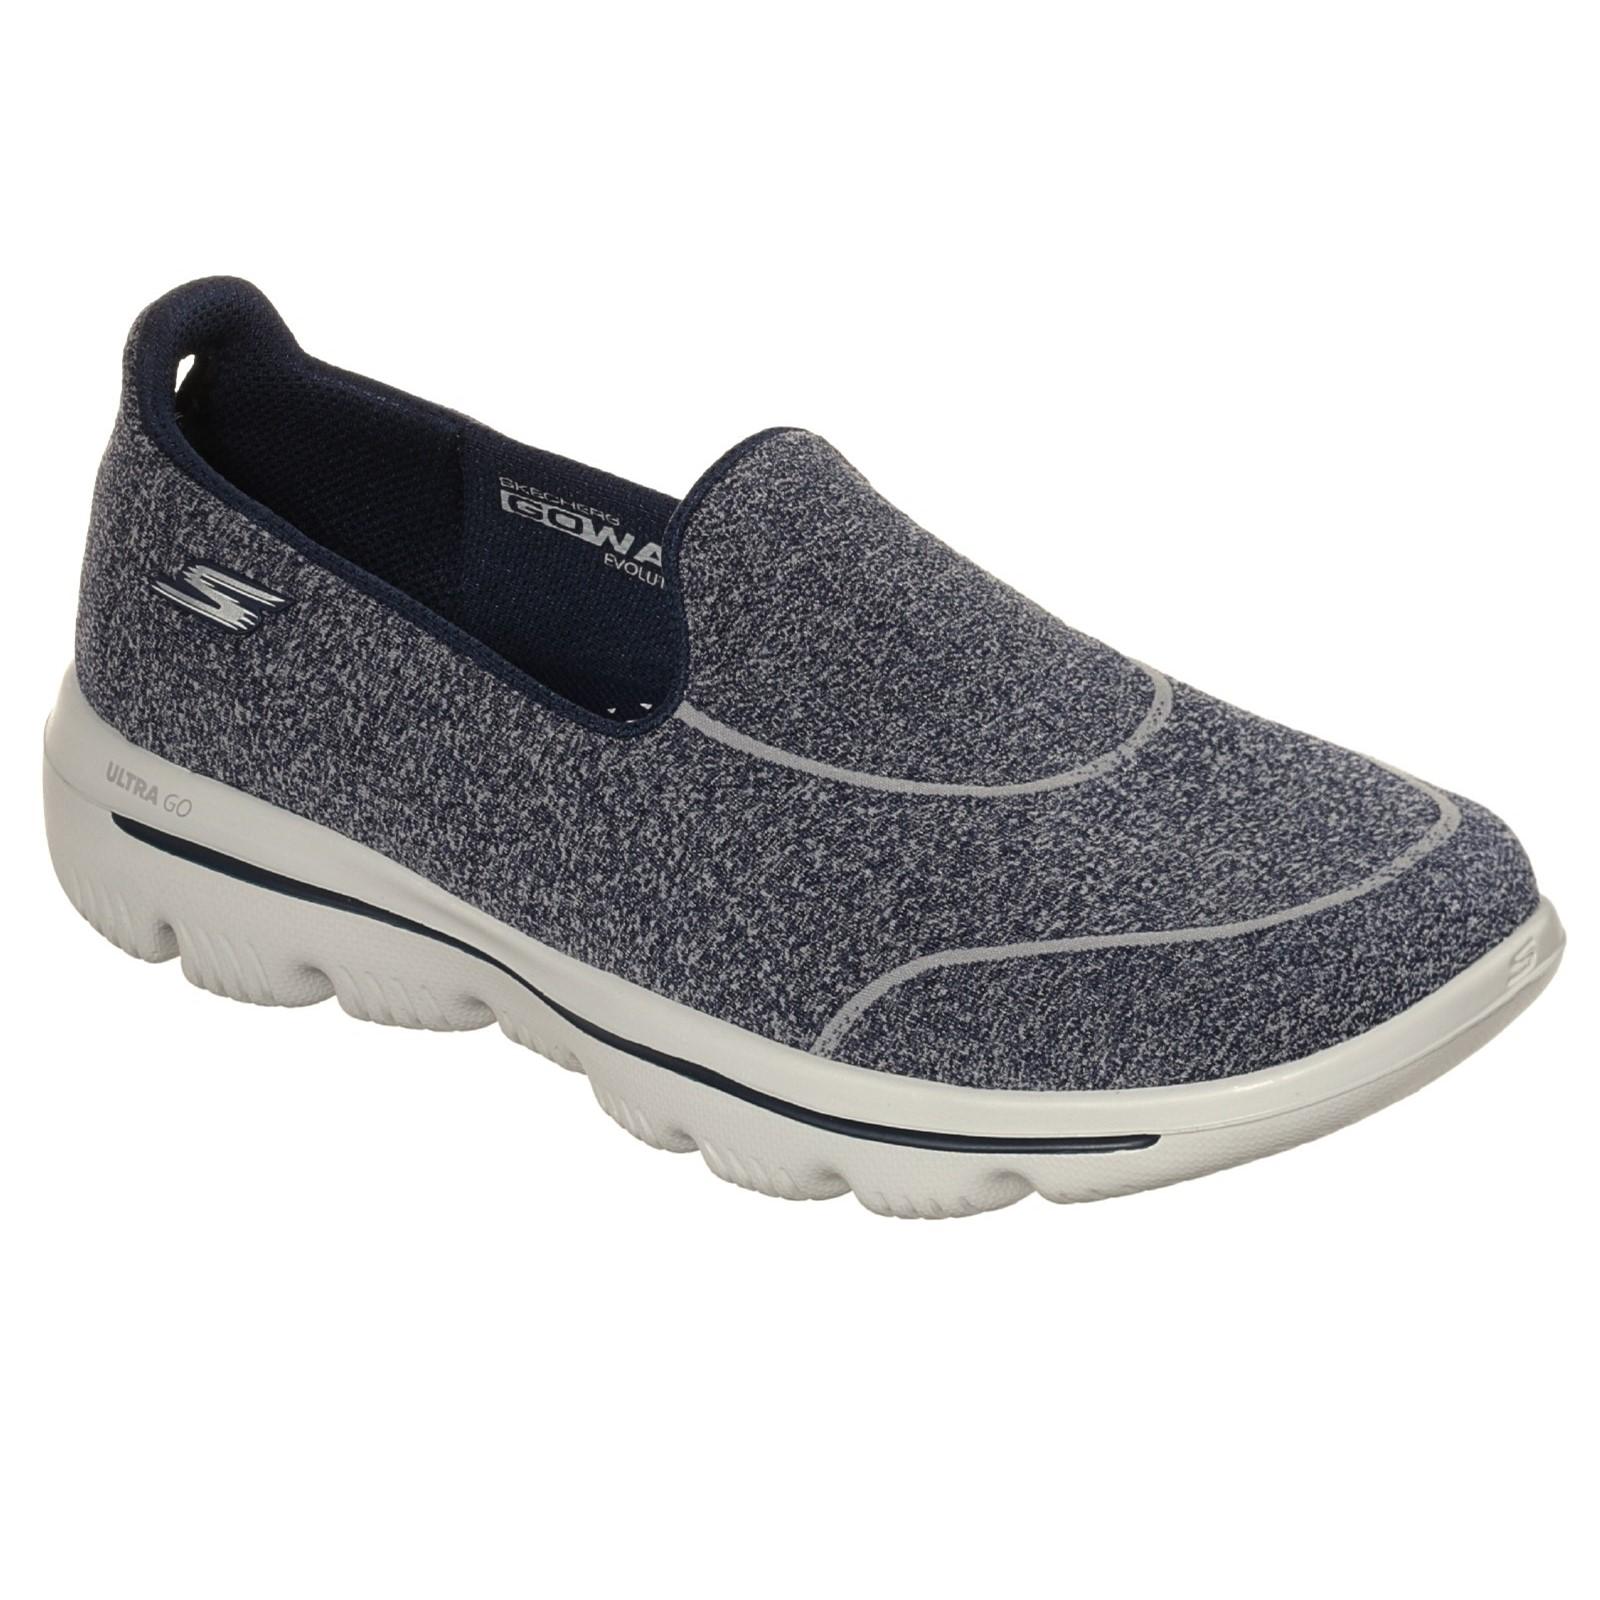 zapatos skechers dama 2018 opiniones uk xl